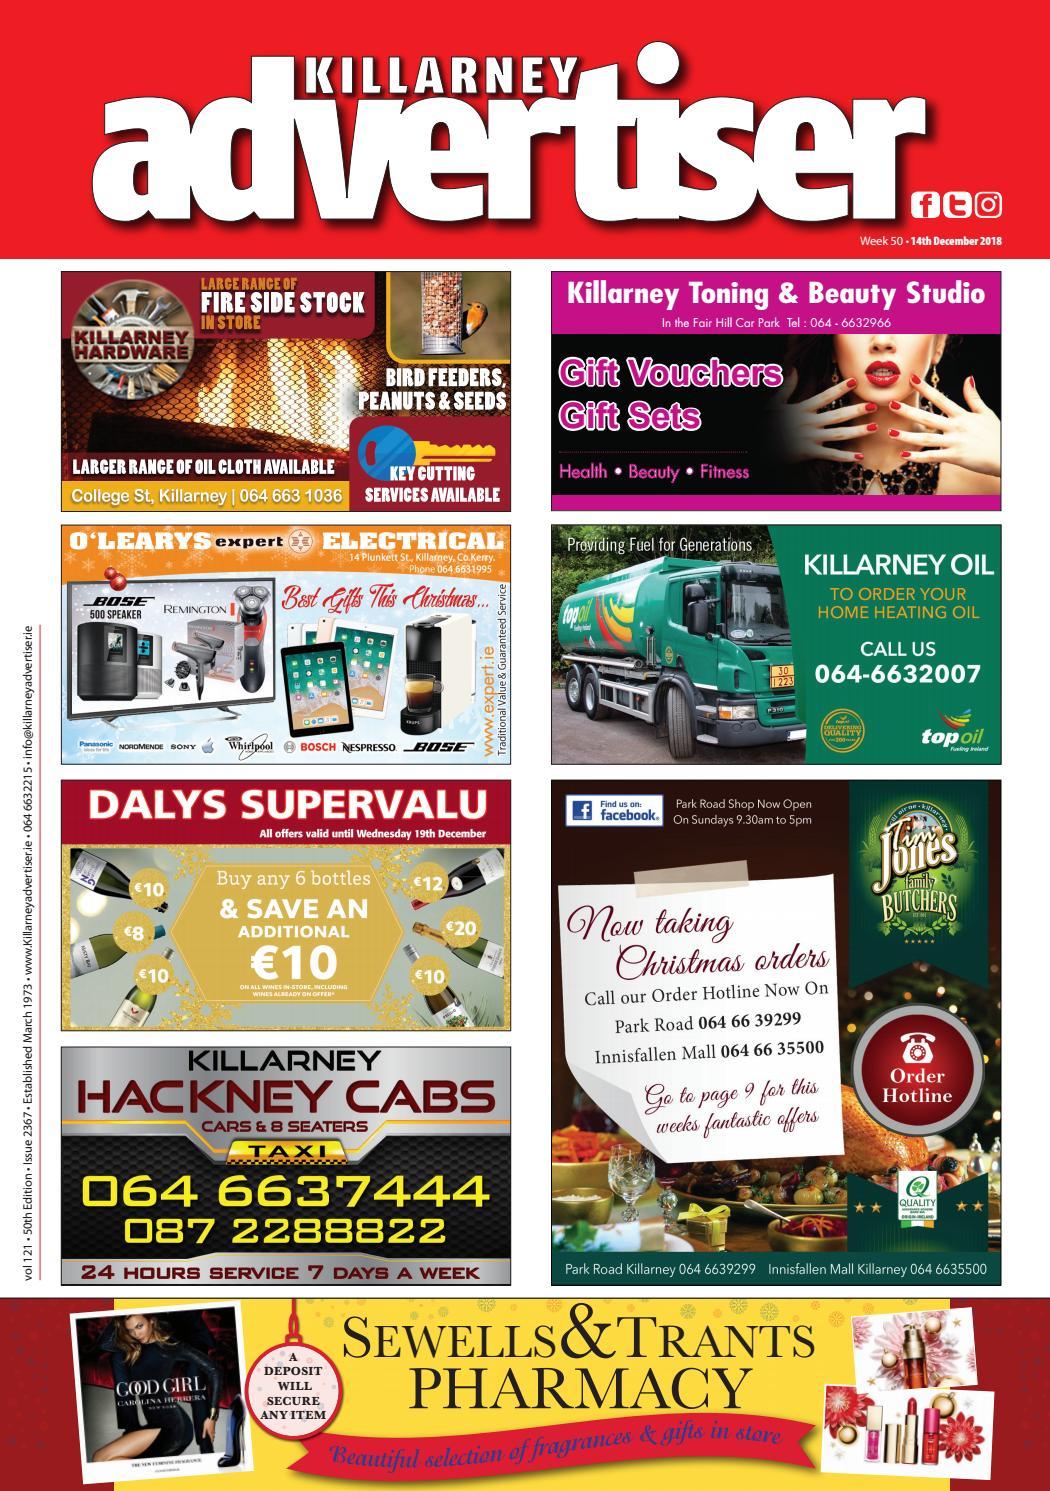 Scotland to Killarney - 11 ways to travel via train, bus and ferry